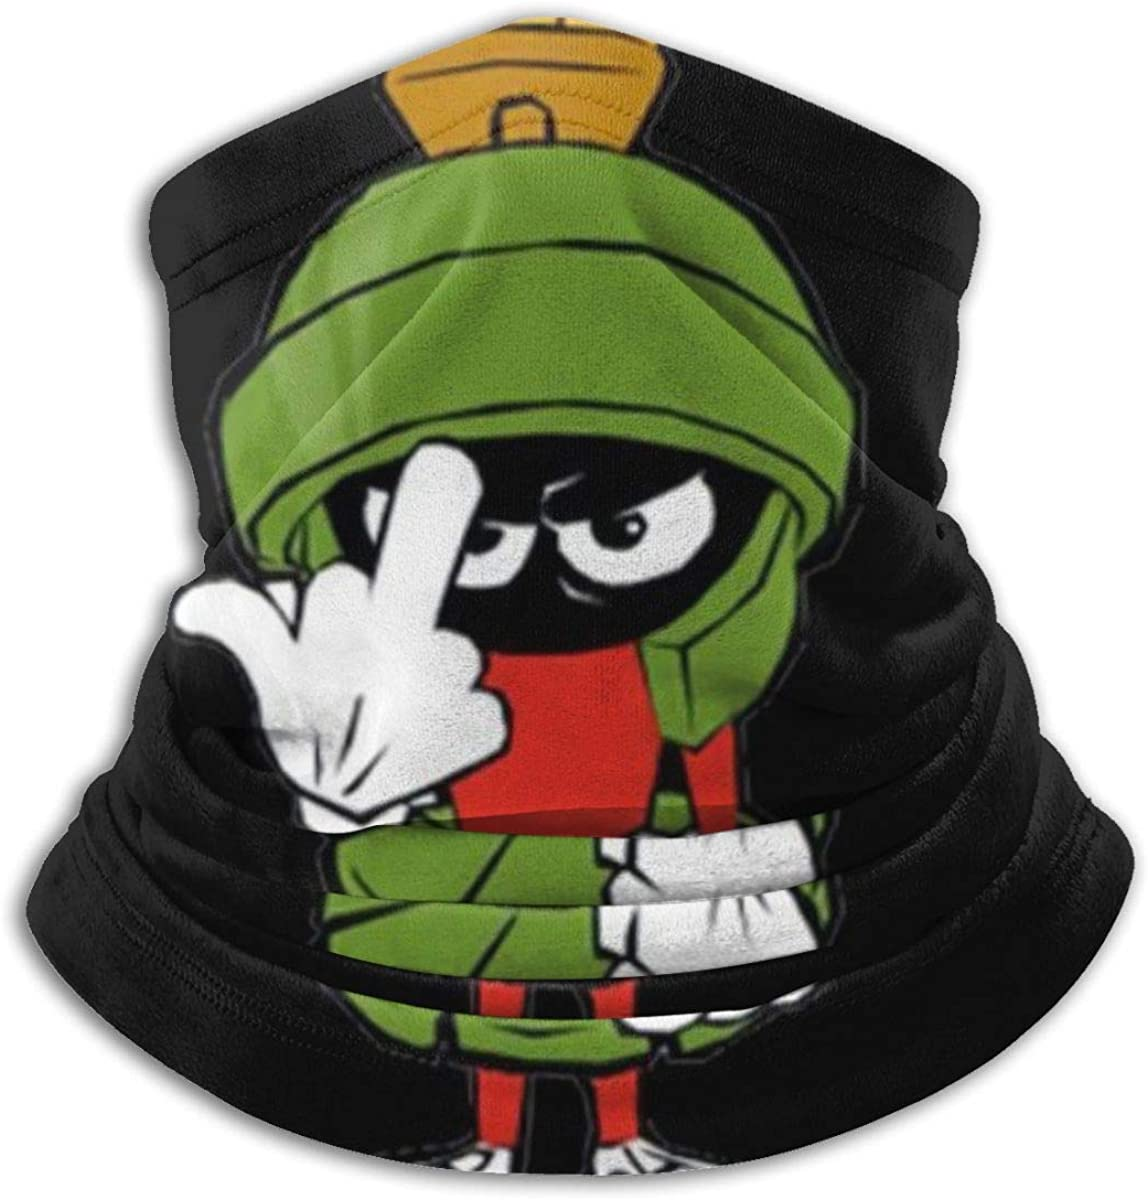 Puffin Pattern Microfiber Neck Warmer Balaclavas Soft Fleece Headwear Face Scarf Cover for Winter